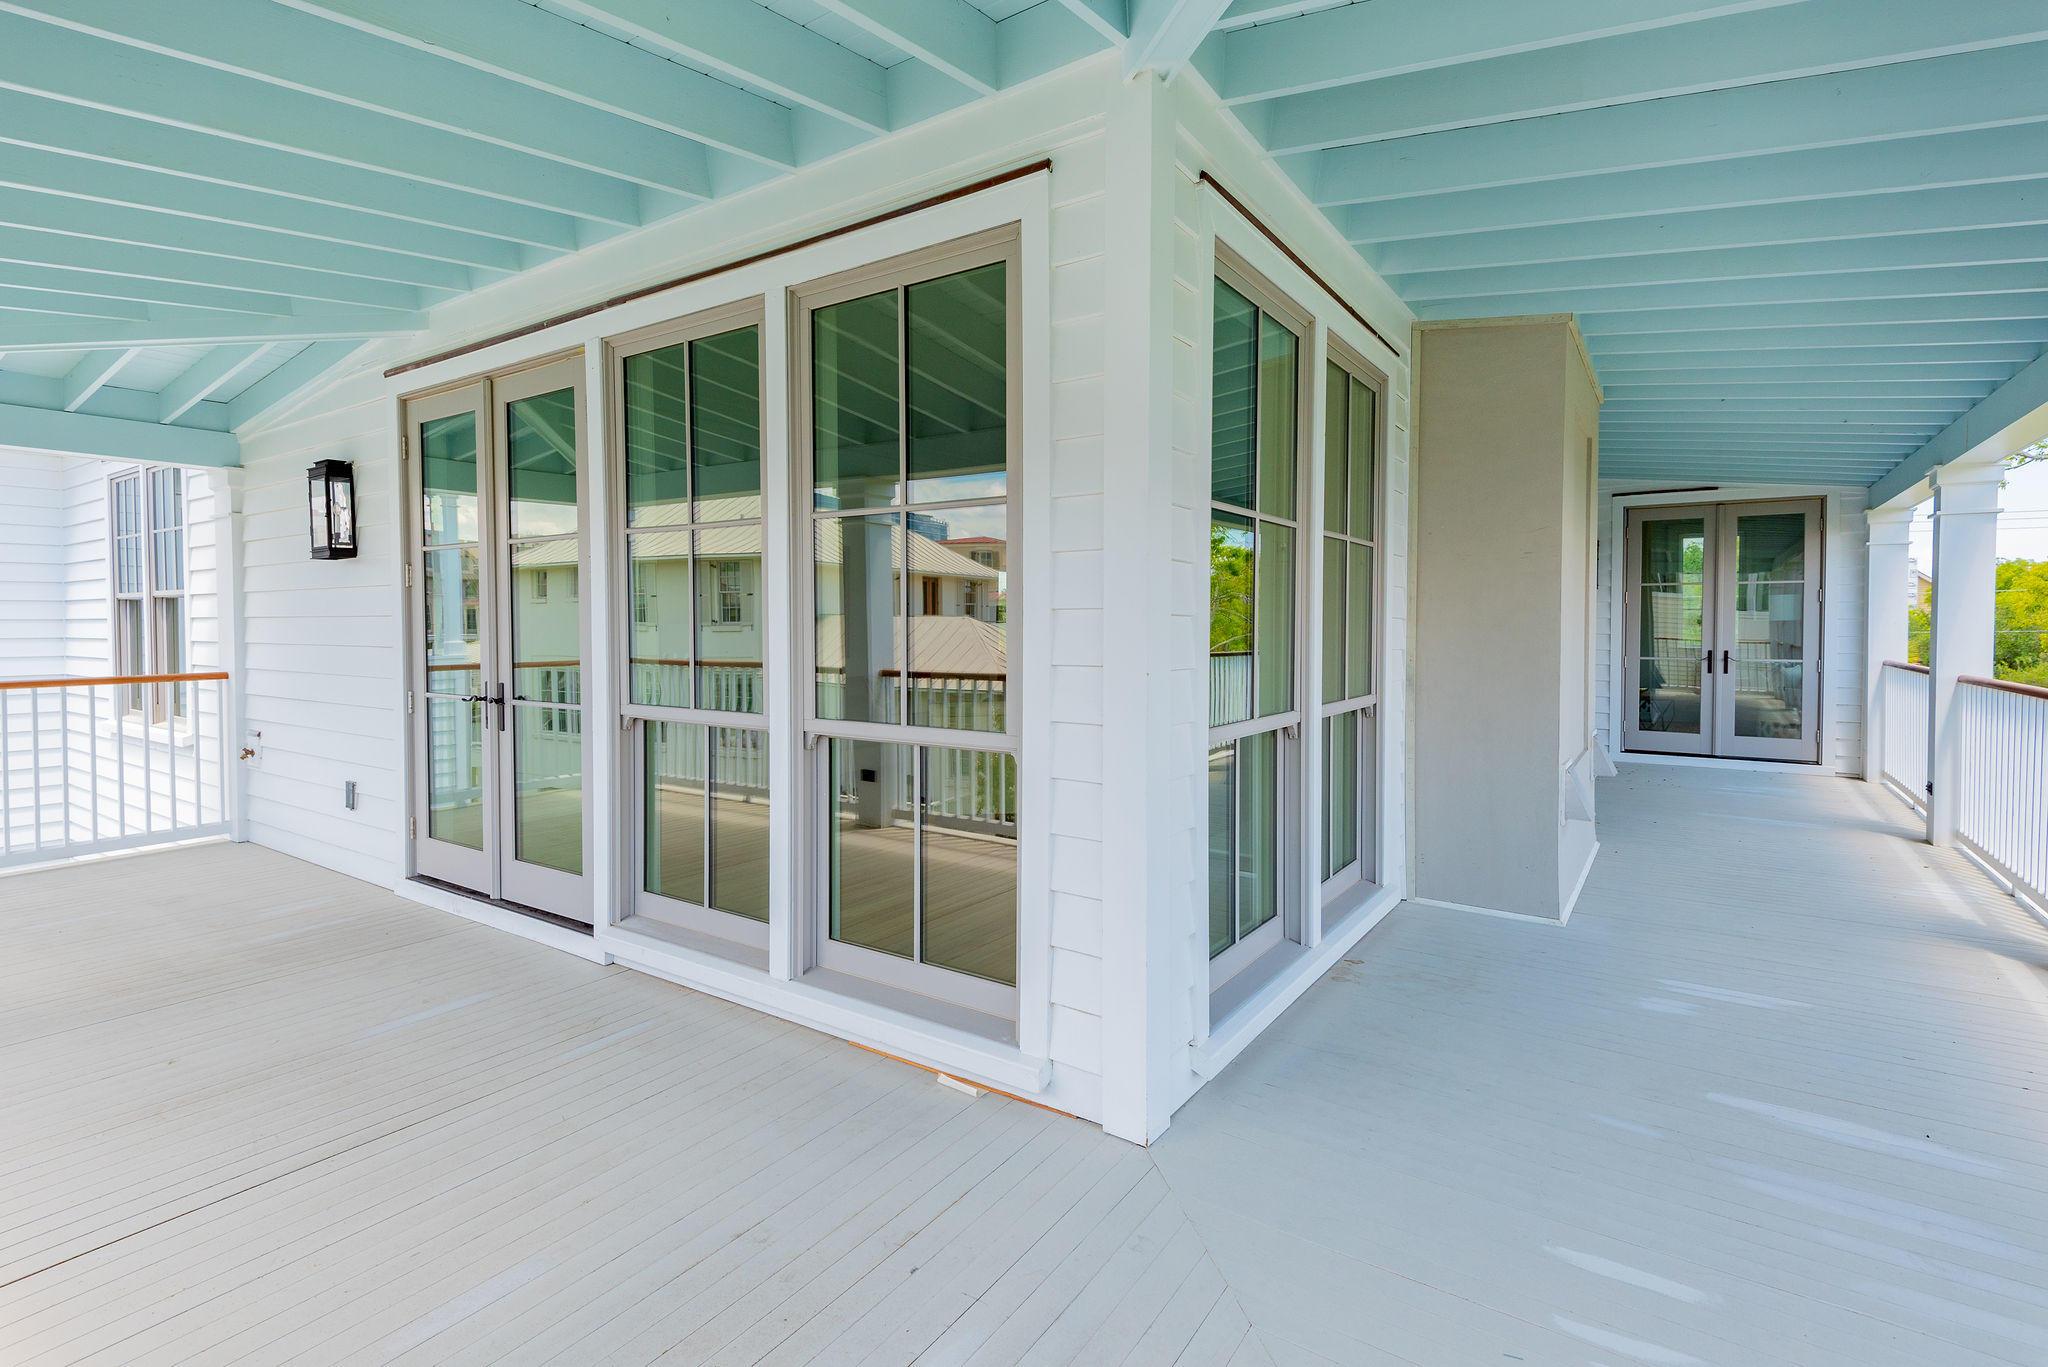 Harleston Village Homes For Sale - 55 Barre, Charleston, SC - 1